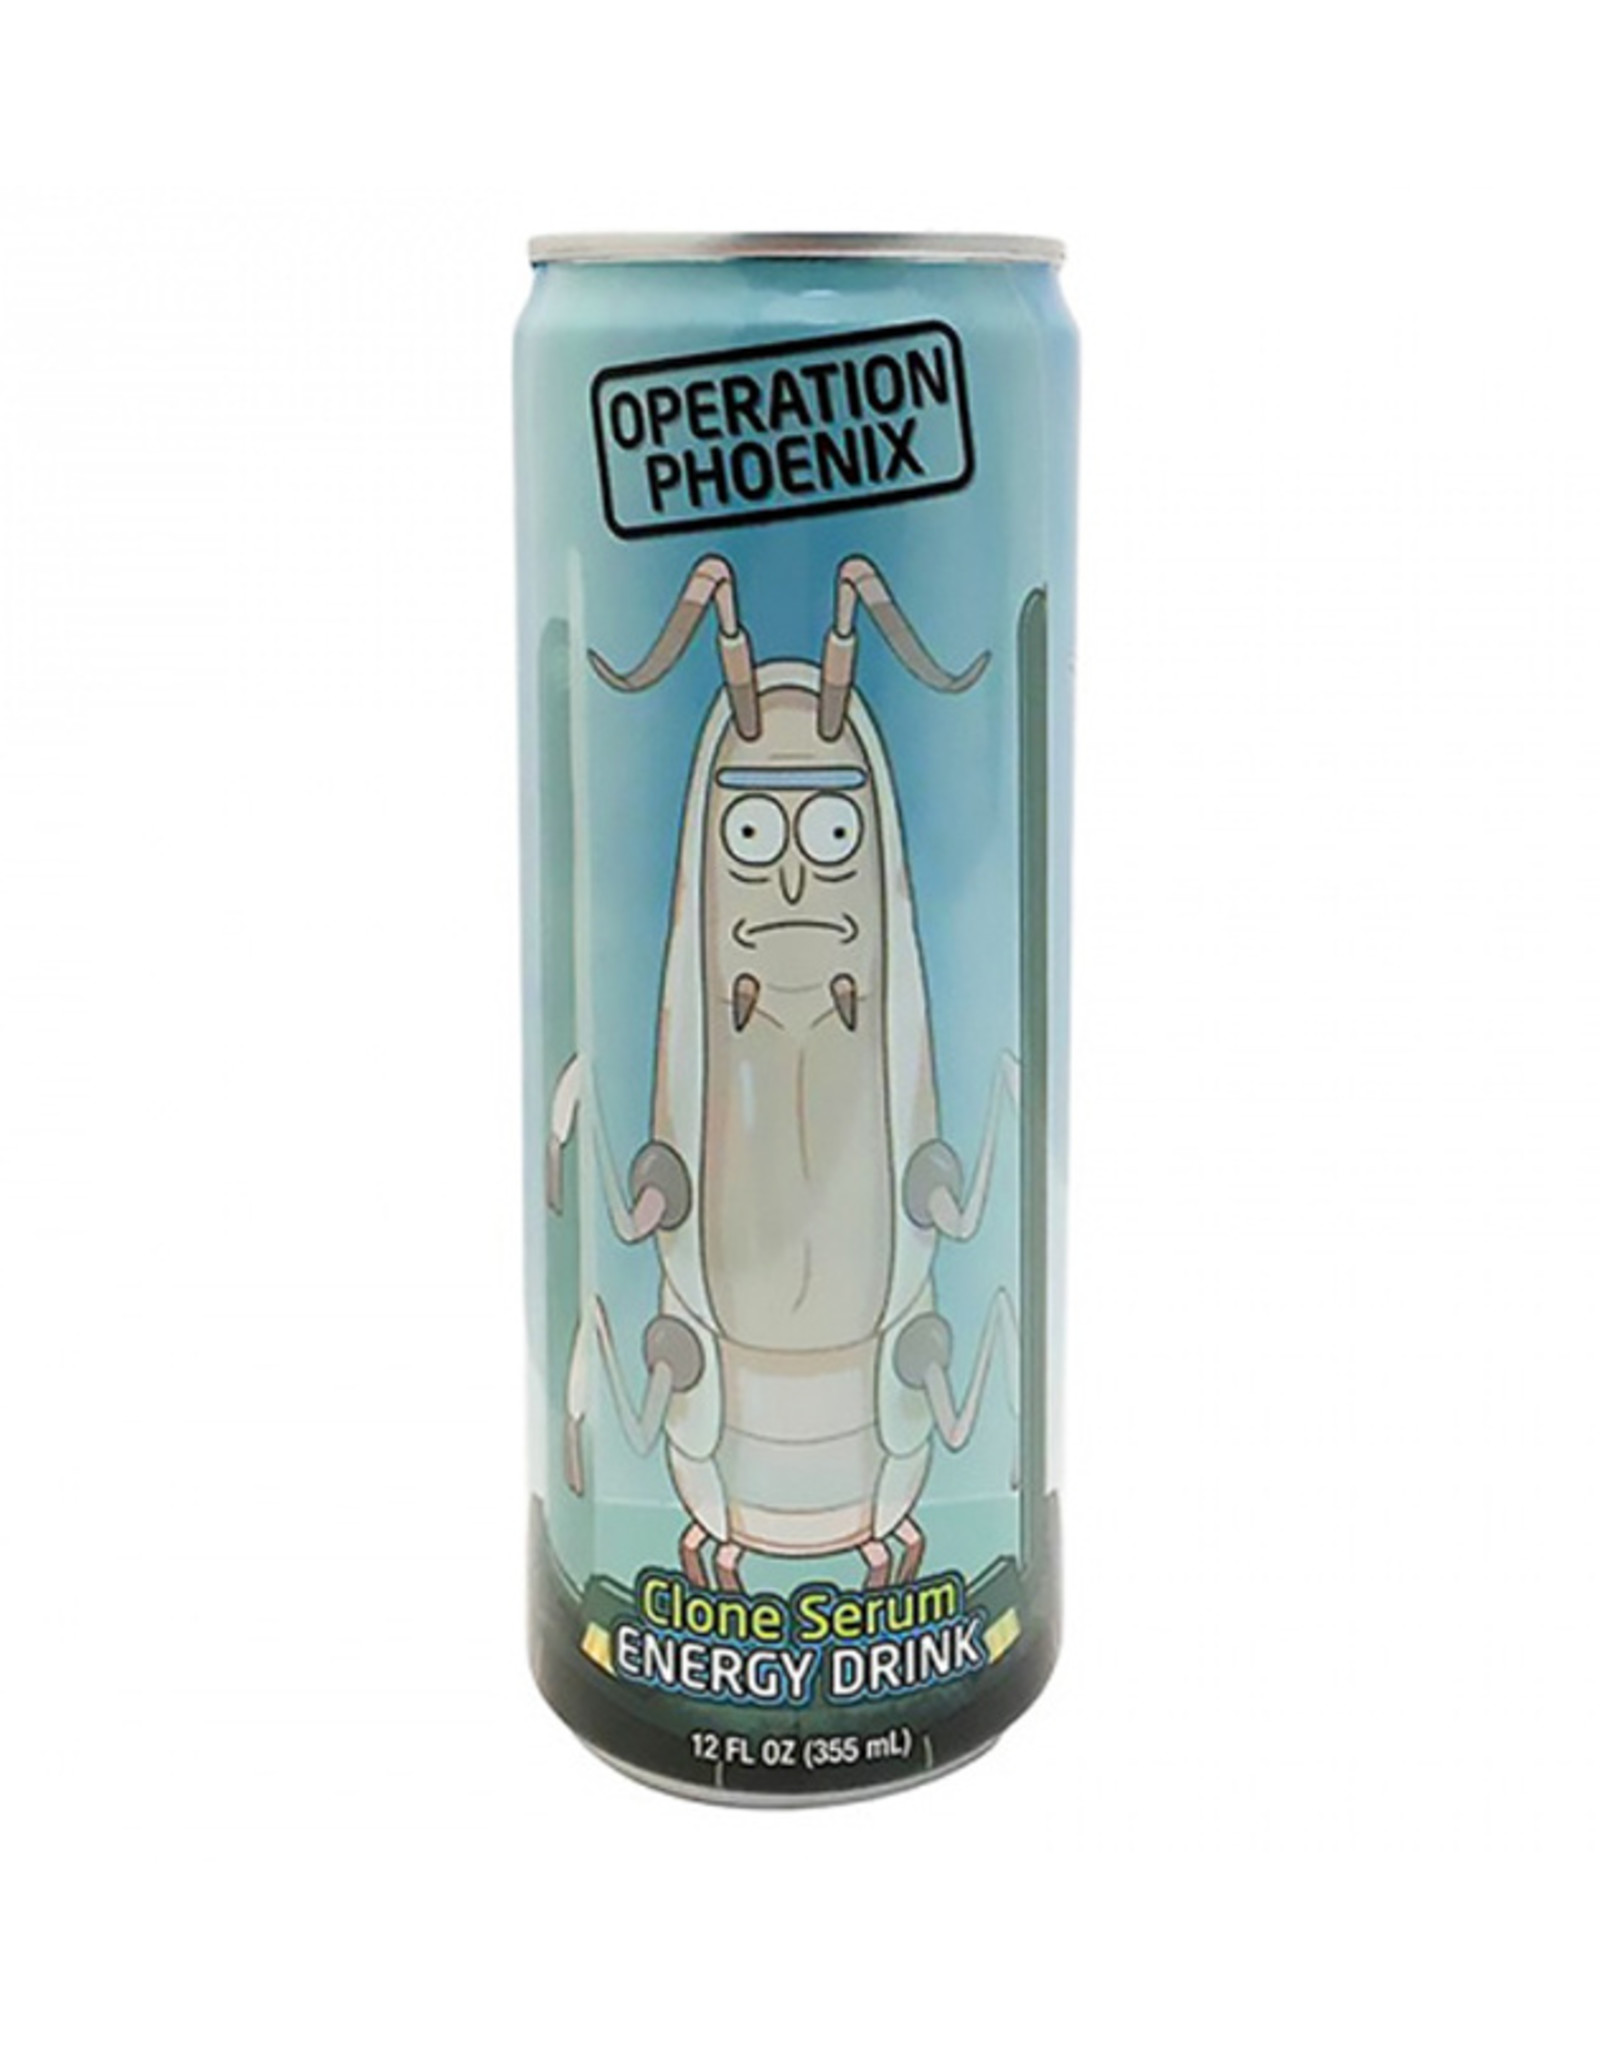 Rick & Morty - Operation Phoenix Clone Serum Energy Drink